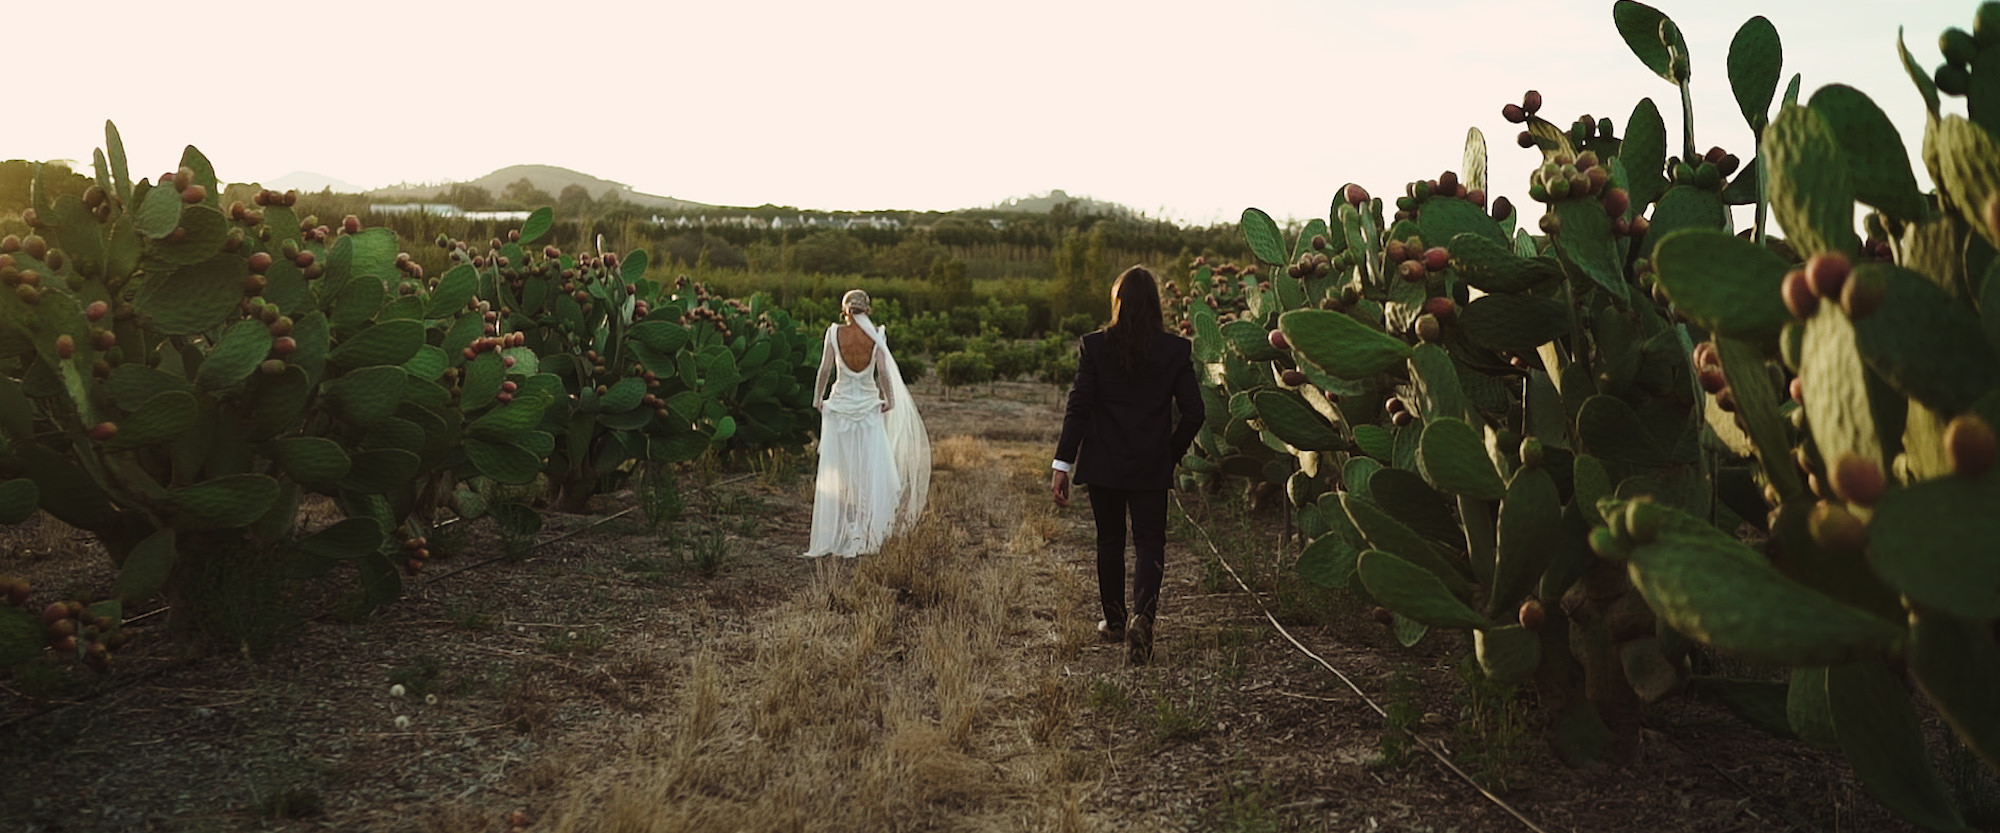 HeathEmelieWeddingFilm_Babylonstoren_Wedding_7.jpg